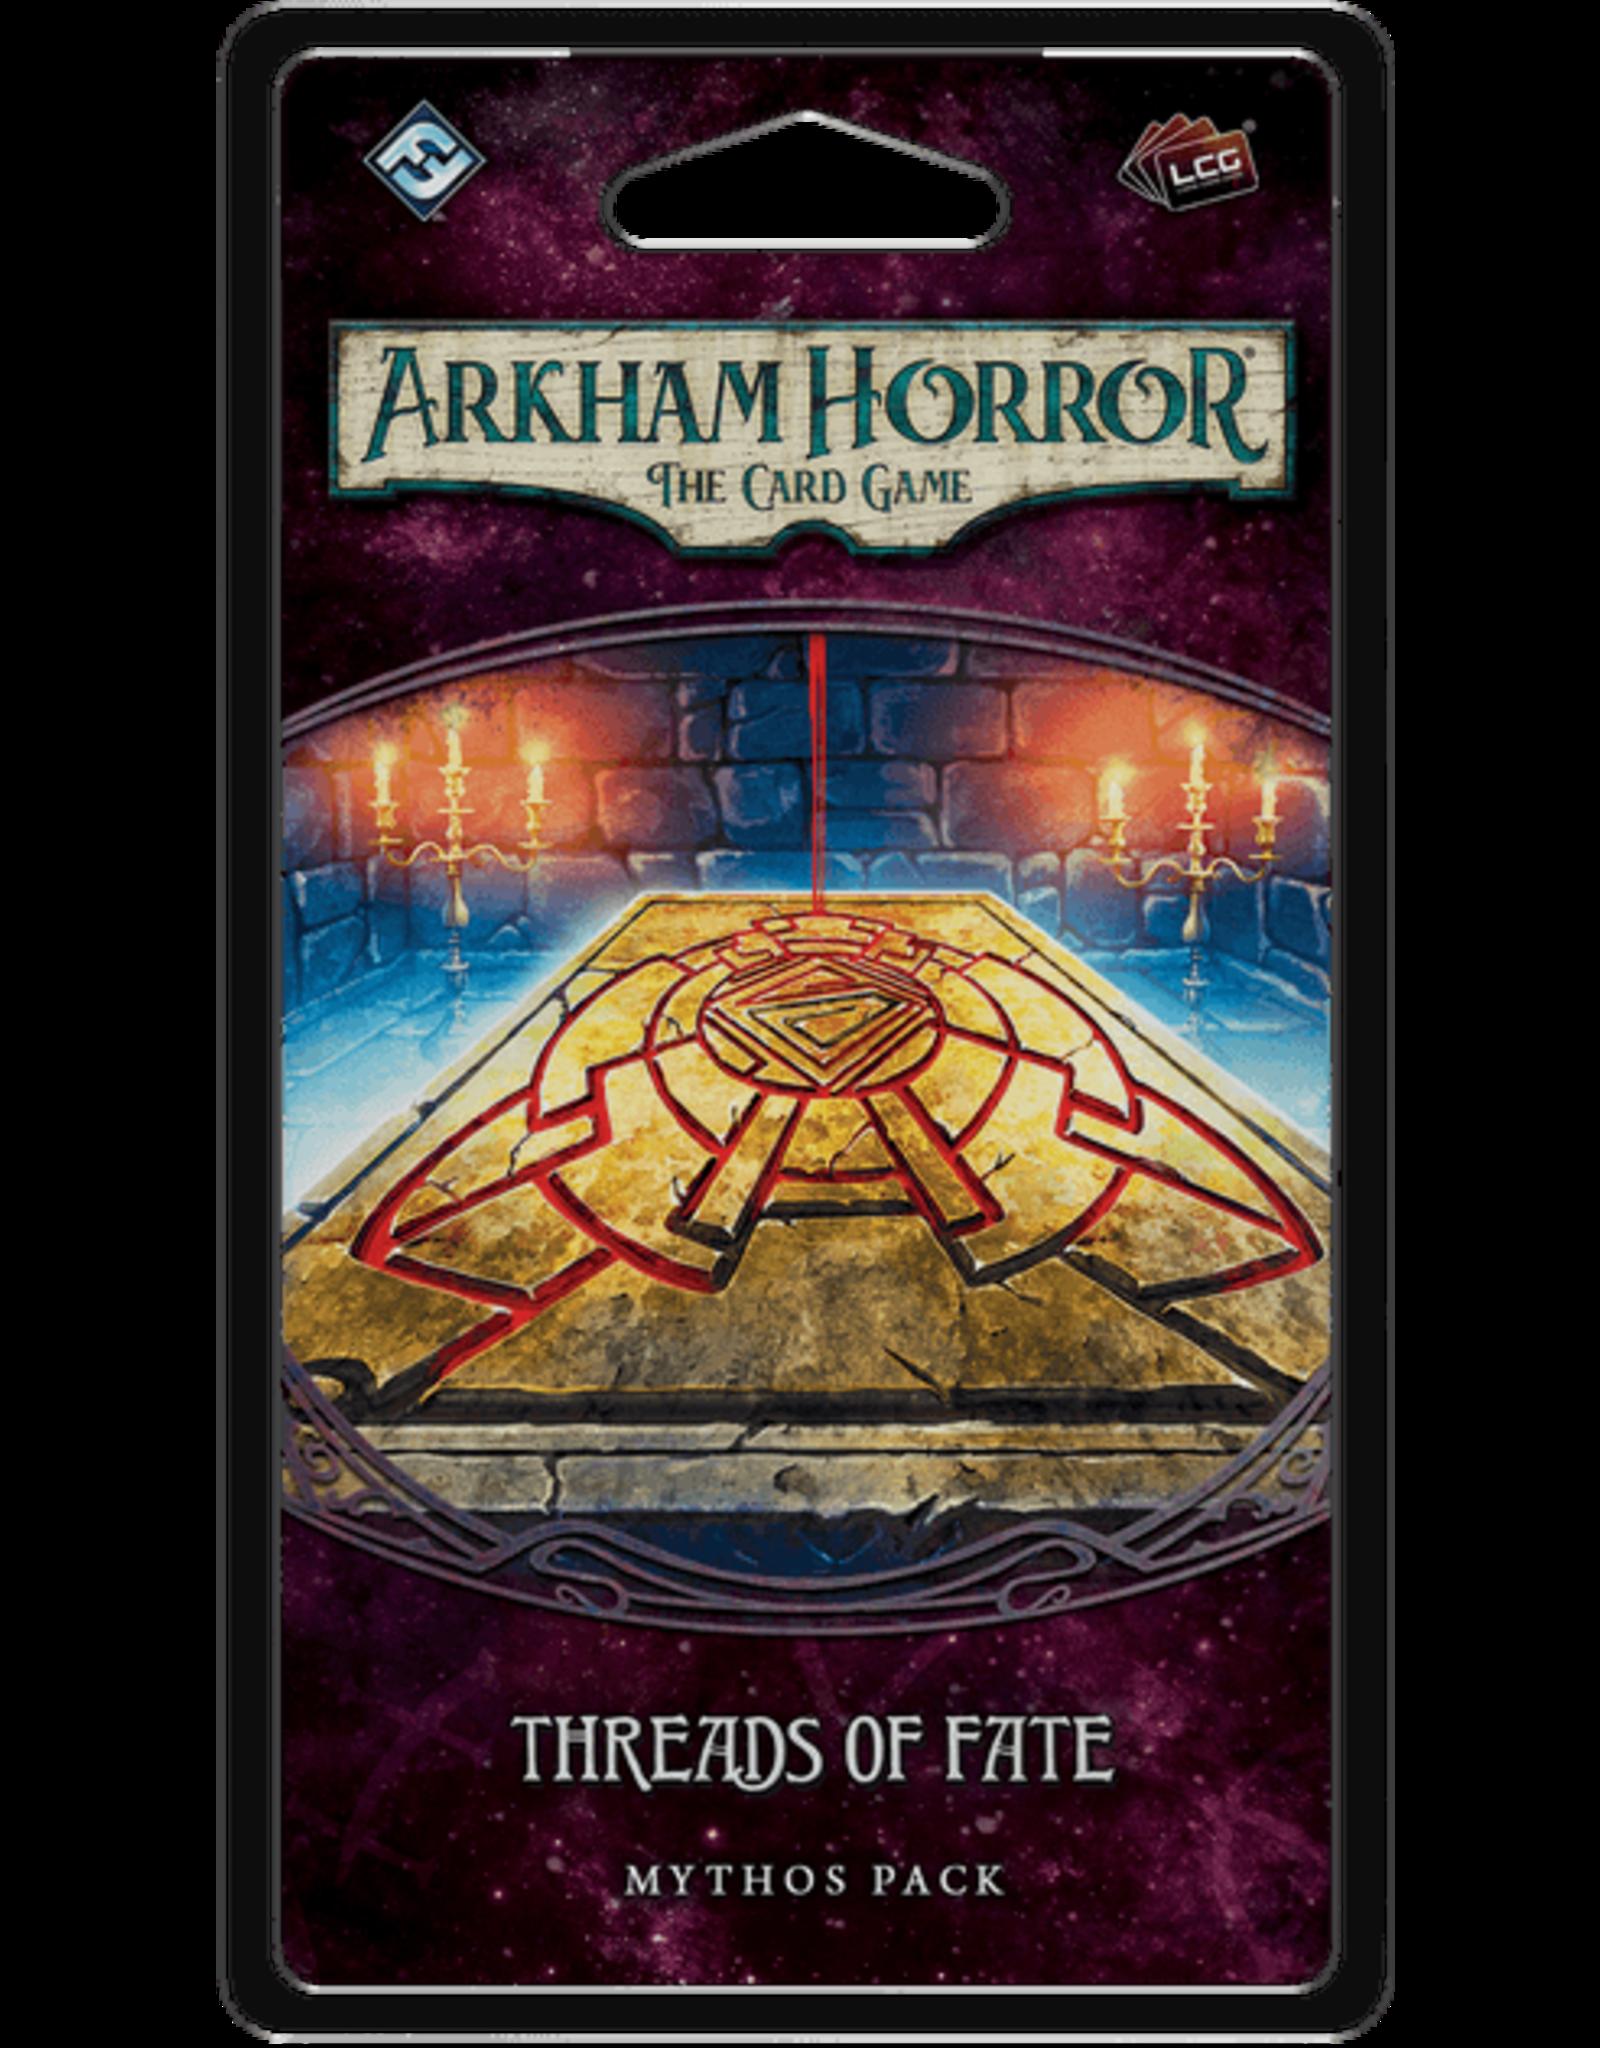 Arkham Horror LCG Threads of Fate Mythos Pack